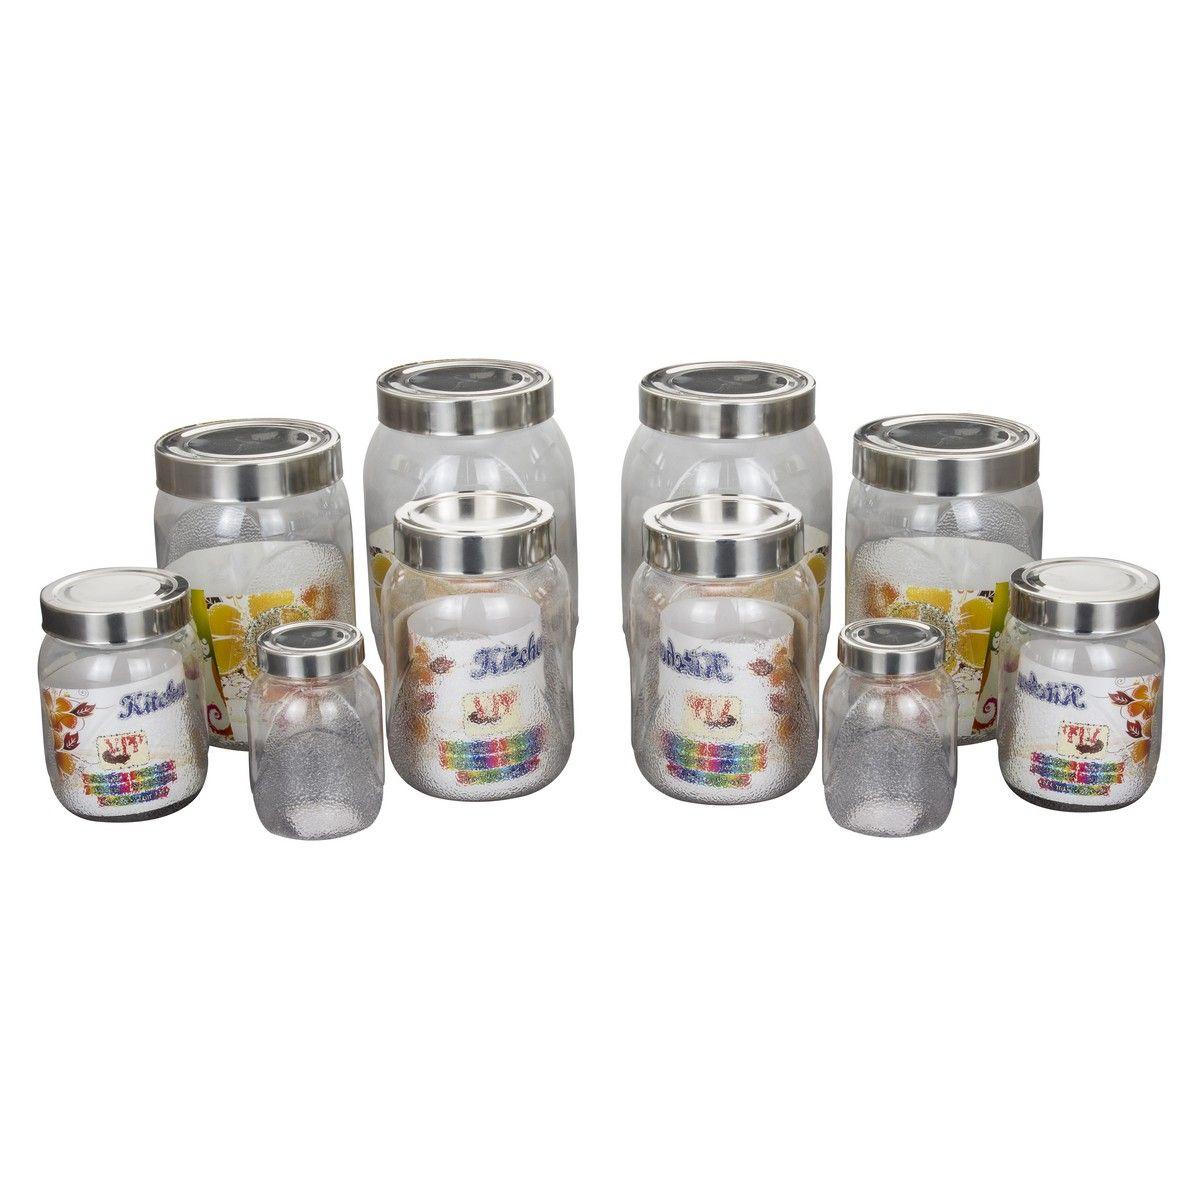 Buy klassic vimal kitchens pet set of 10pcs kv084 online for Kitchen set naaptol